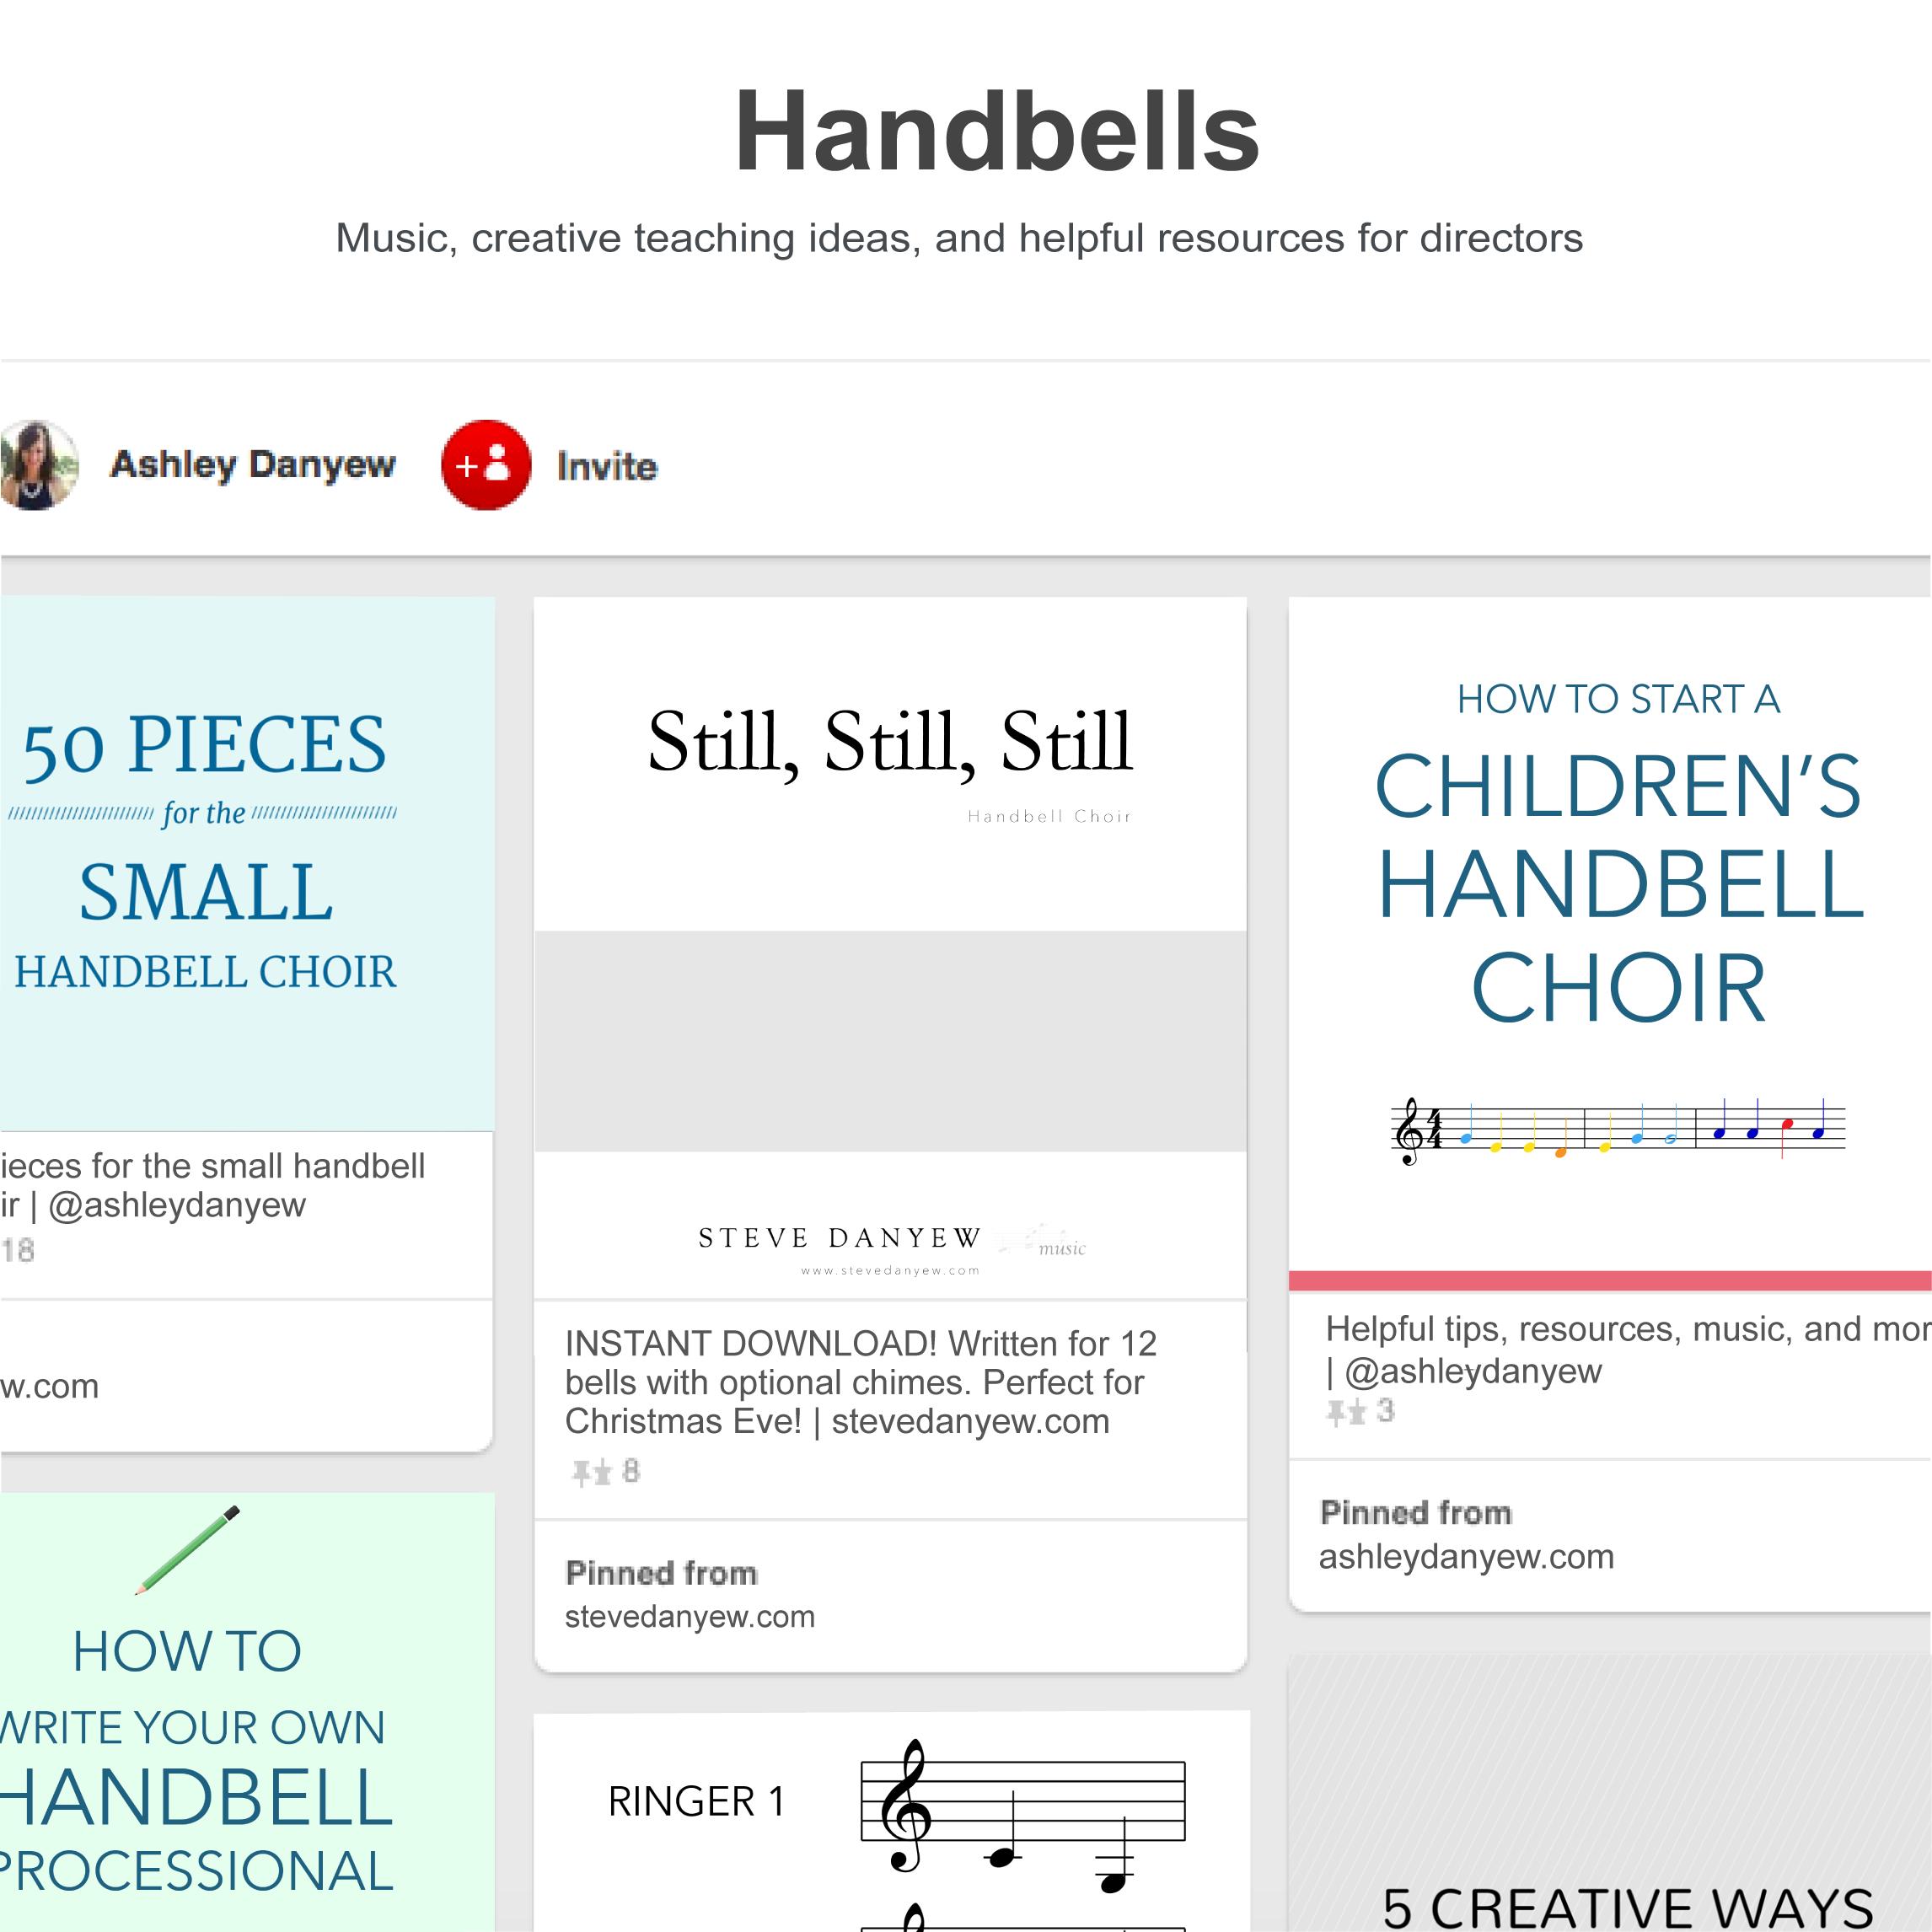 My favorite Pinterest boards for handbells   @ashleydanyew